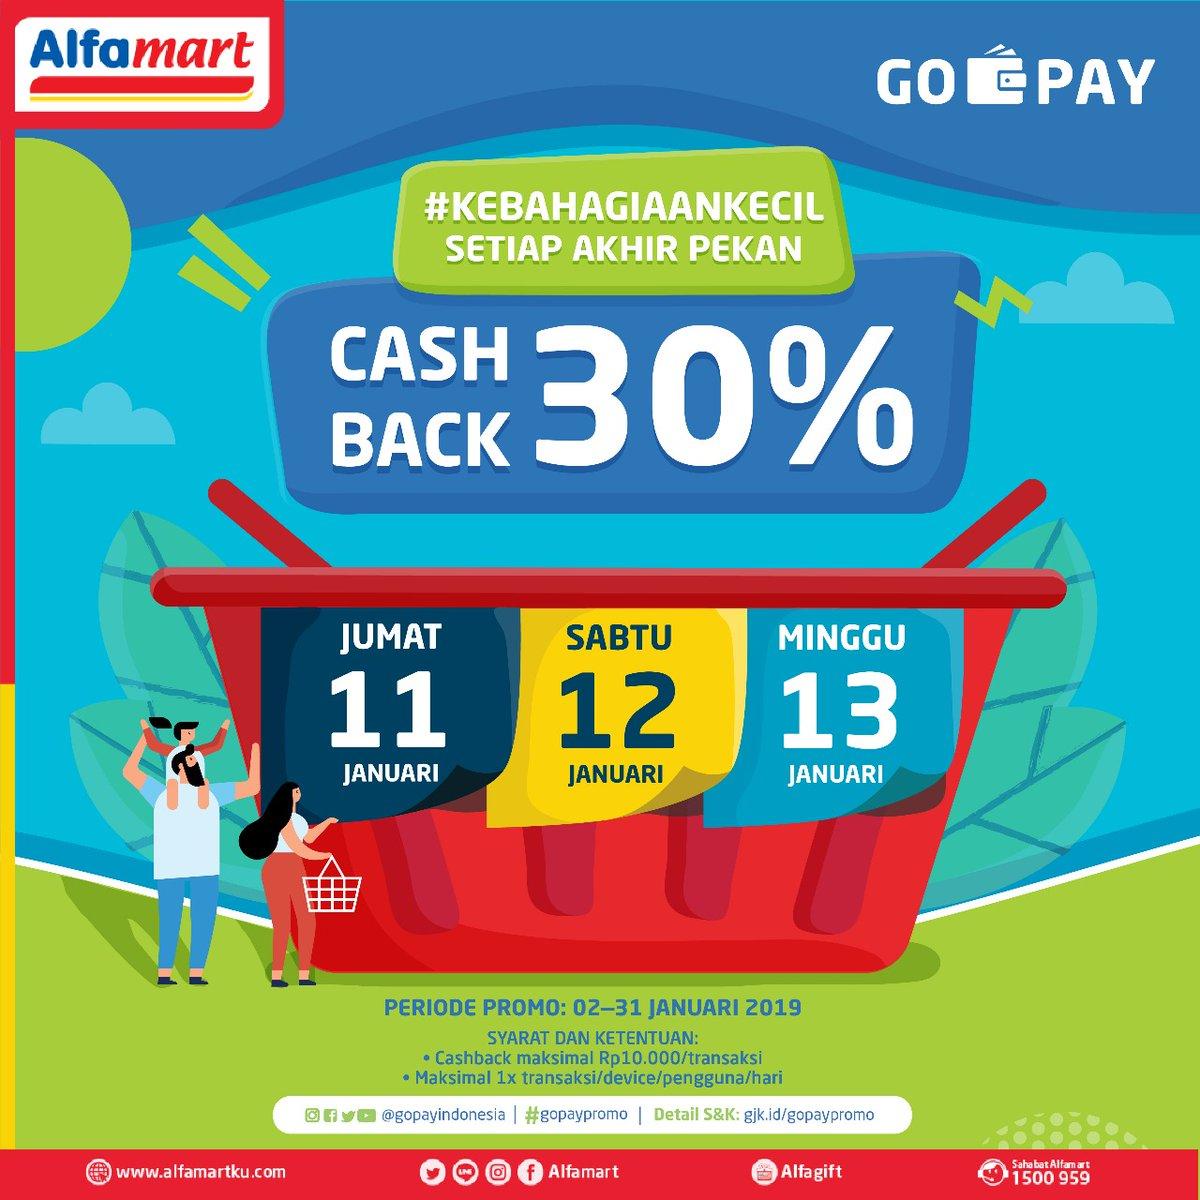 #Alfamart - #Promo #Cashback 30% Pakai #GOPAY Periode 11 - 13 Januari 2019